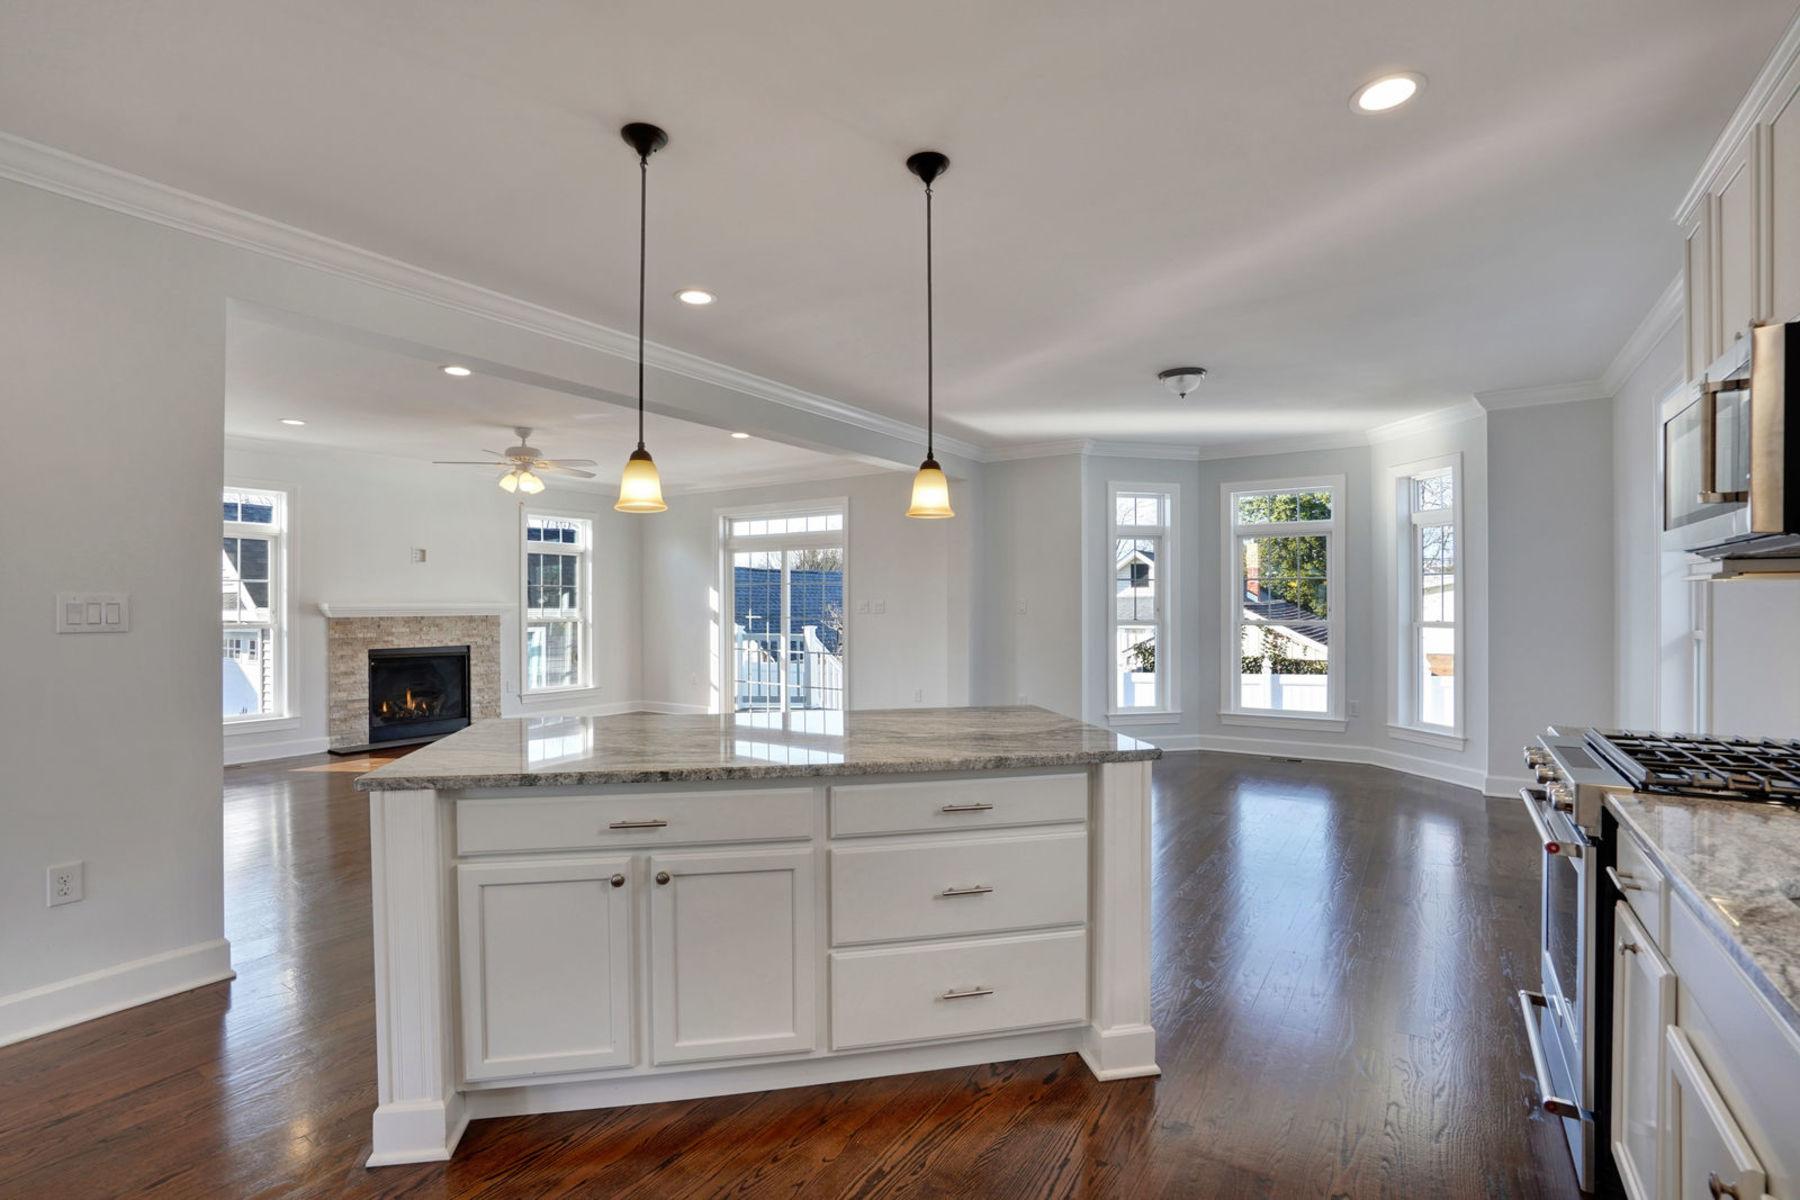 Moradia para Venda às New Construction With Open Floor Plan 512 16th Ave, Belmar, Nova Jersey 07719 Estados Unidos